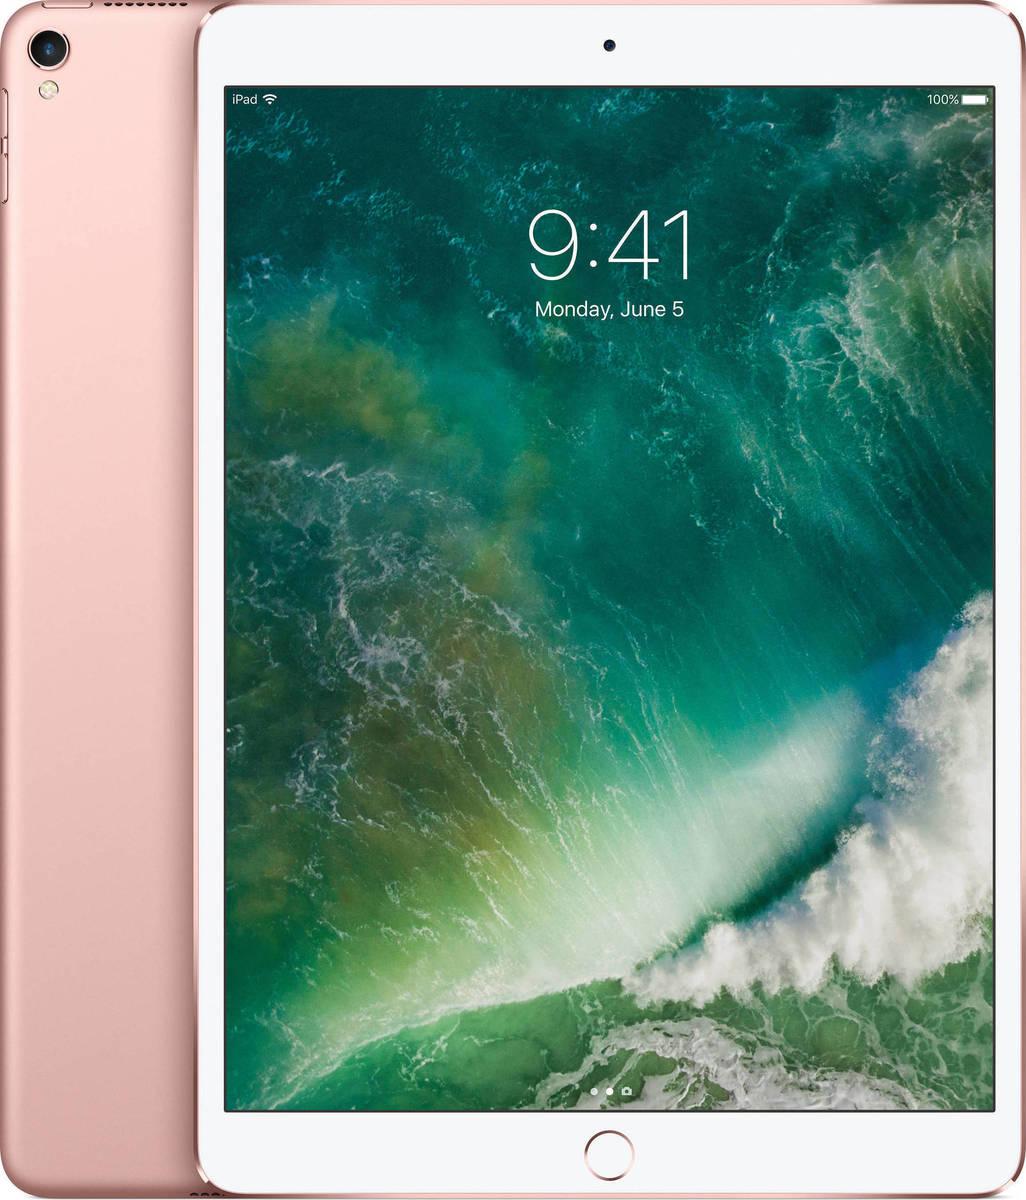 Apple iPad Pro 10.5'' 2017 WiFi 256GB Rose Gold Με Αντάπτορα Πληρωμή έως 12 δόσεις